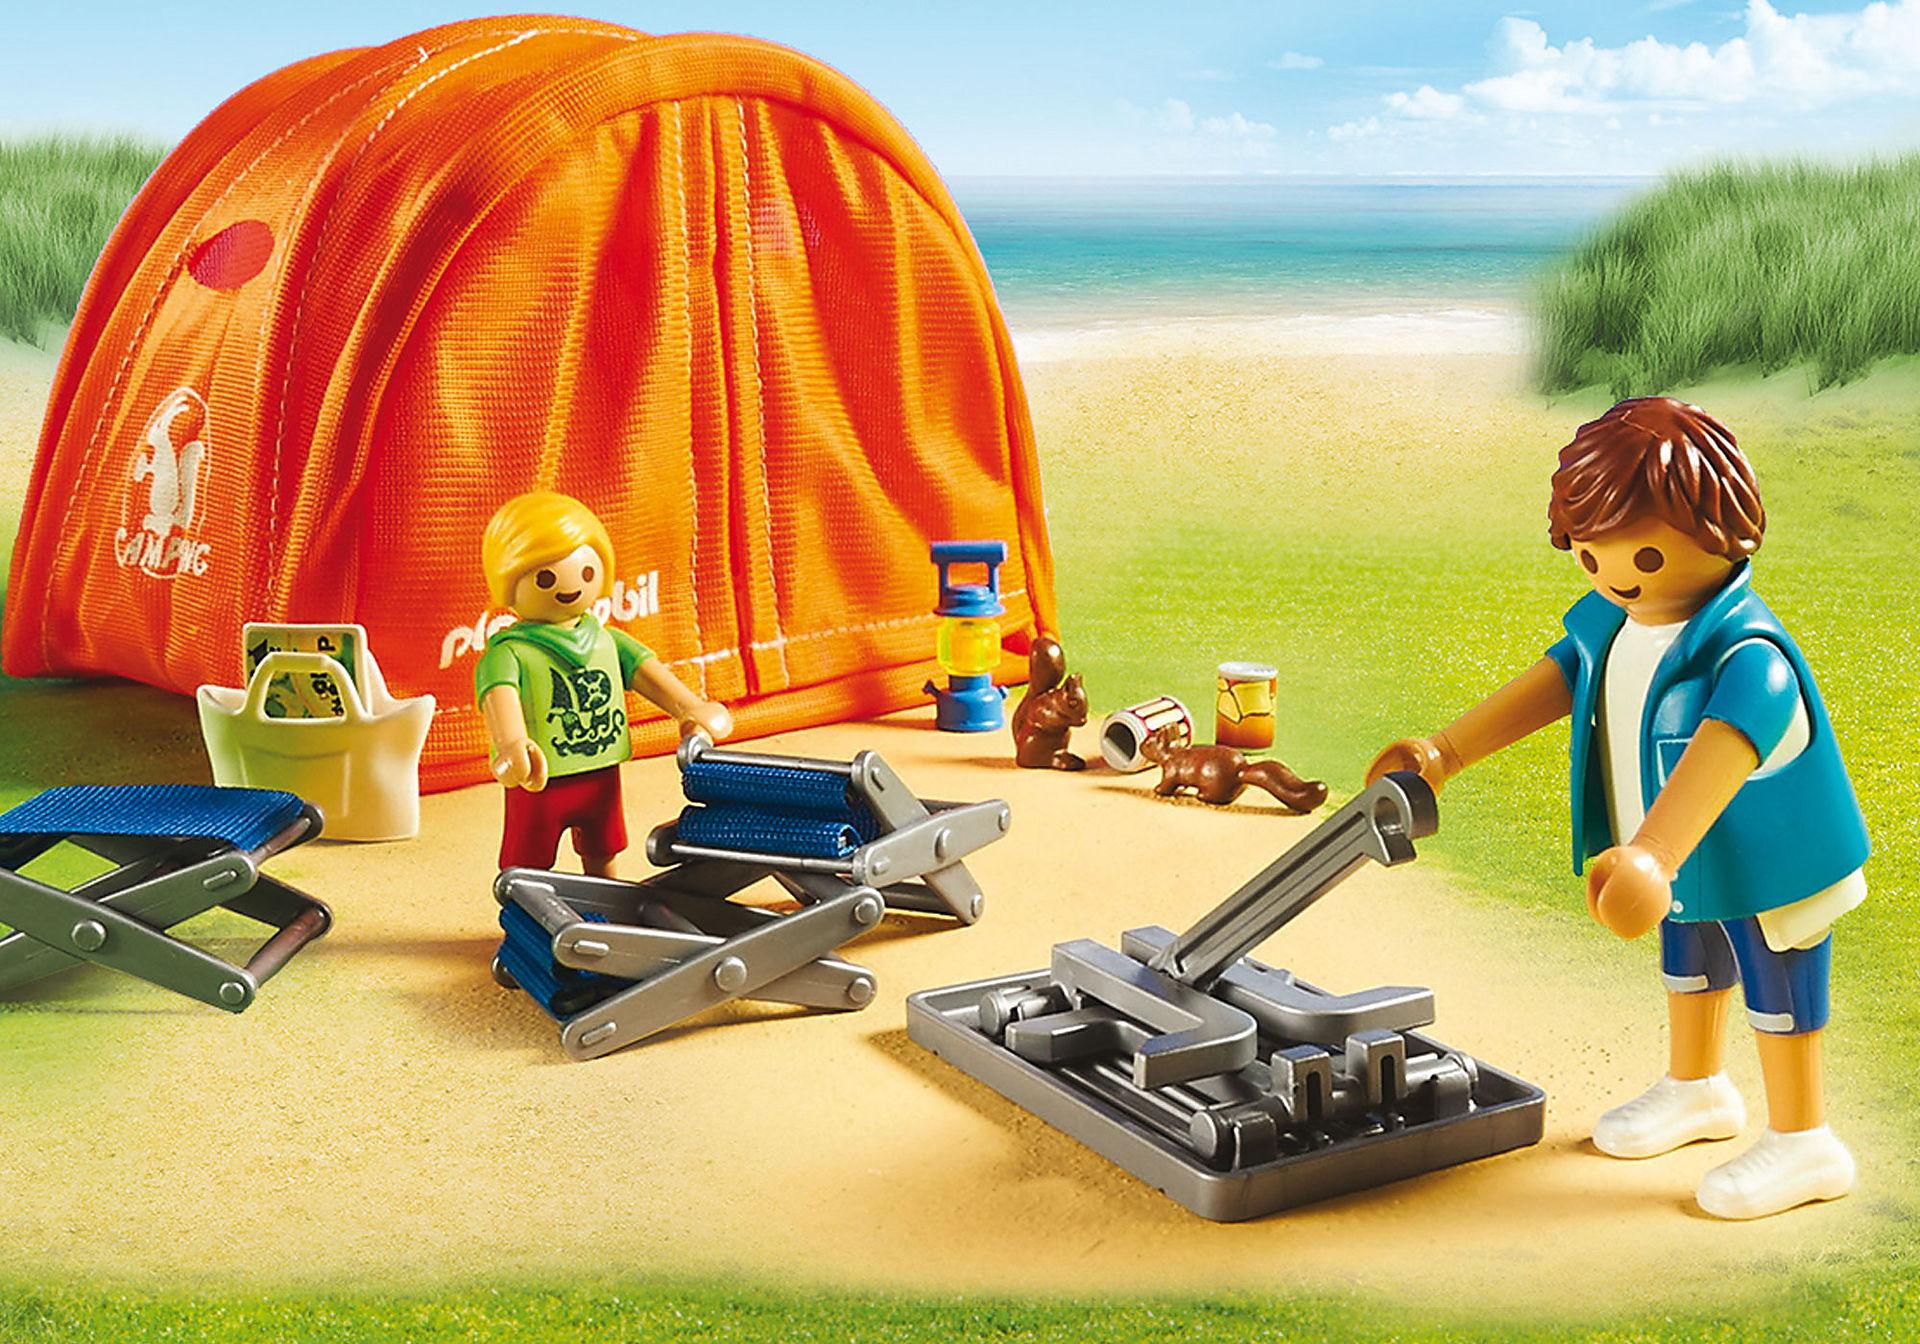 70089 Tente et campeurs zoom image5